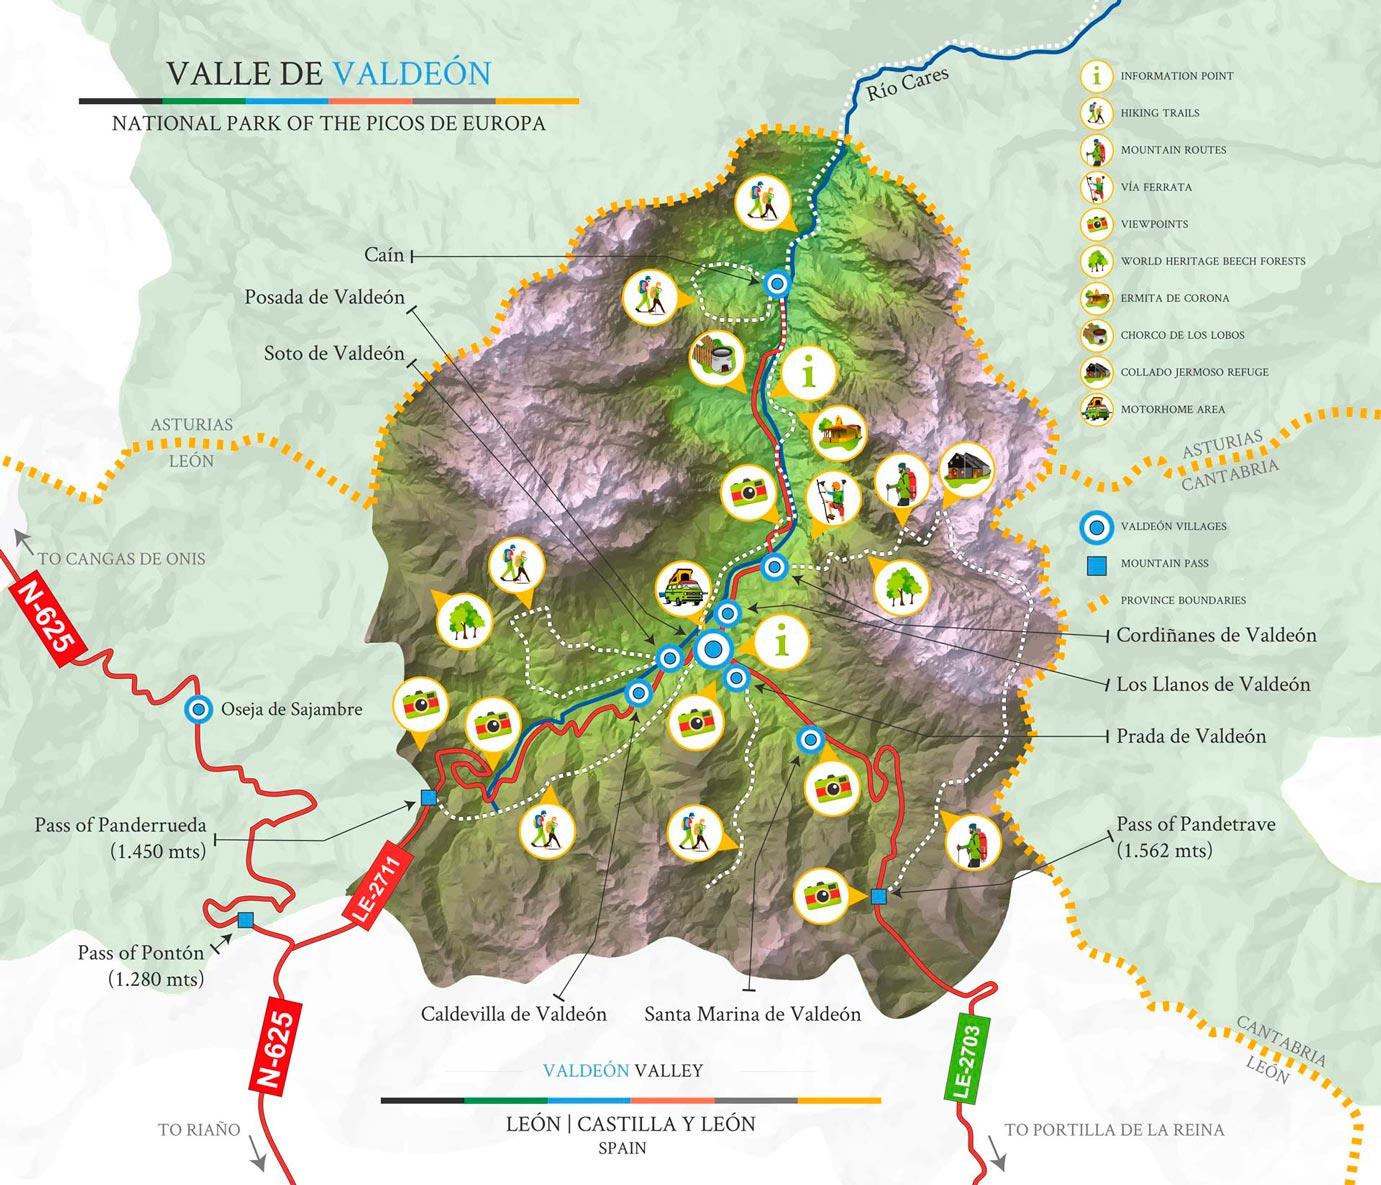 Valdeón Valley municipality map